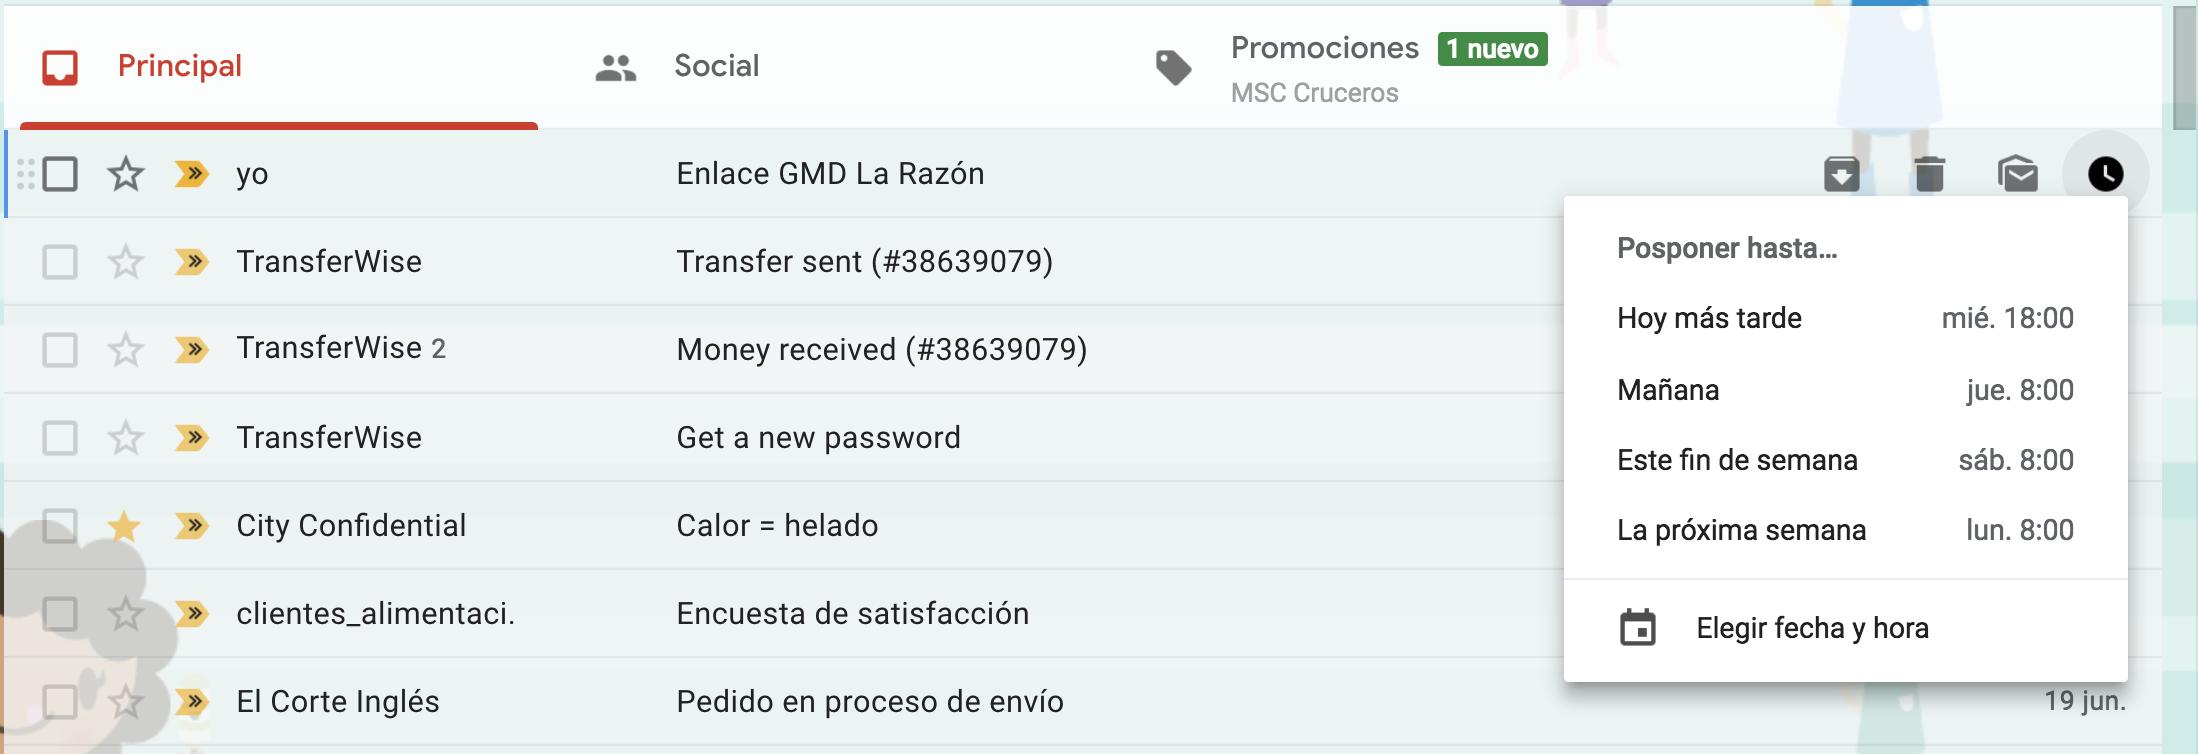 nuevo gmail